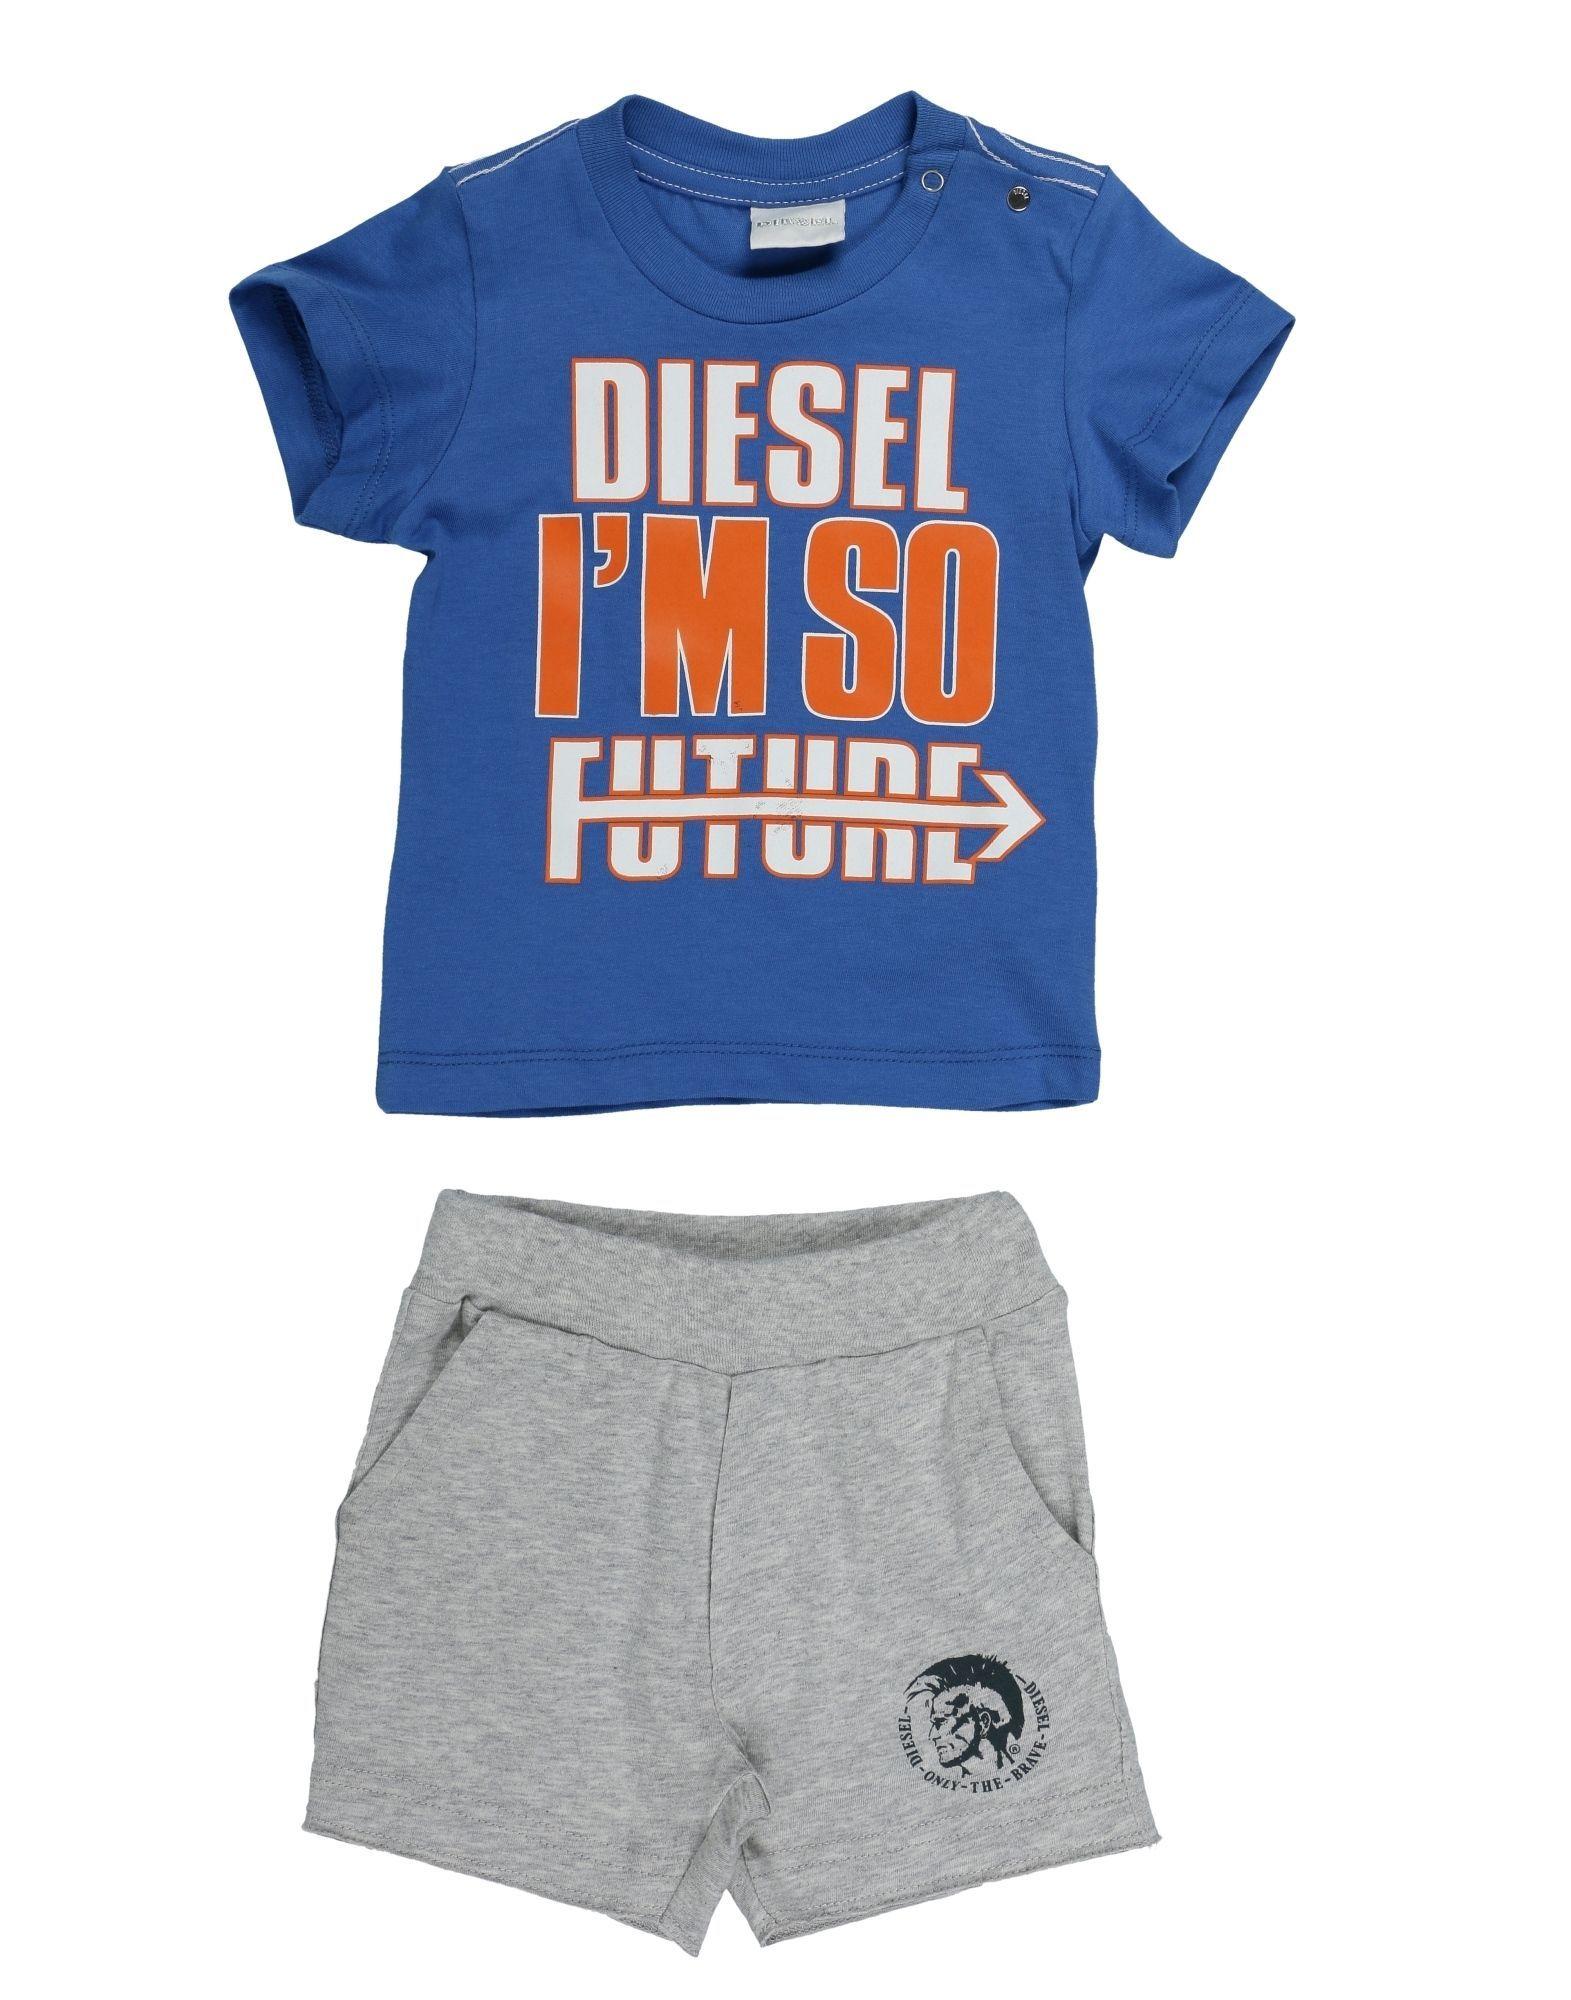 BODYSUITS & SETS Diesel Blue Man Cotton